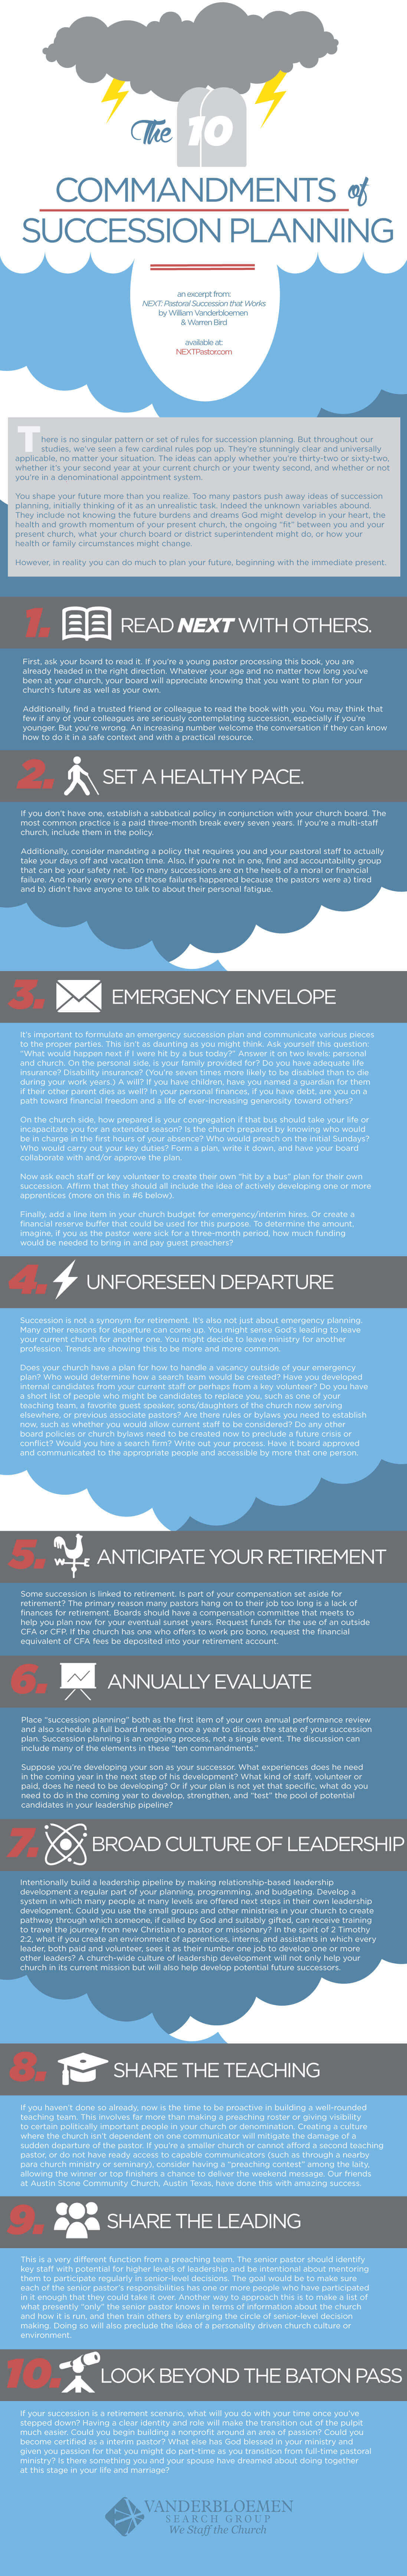 10-Commandments-of-Succession-Planning